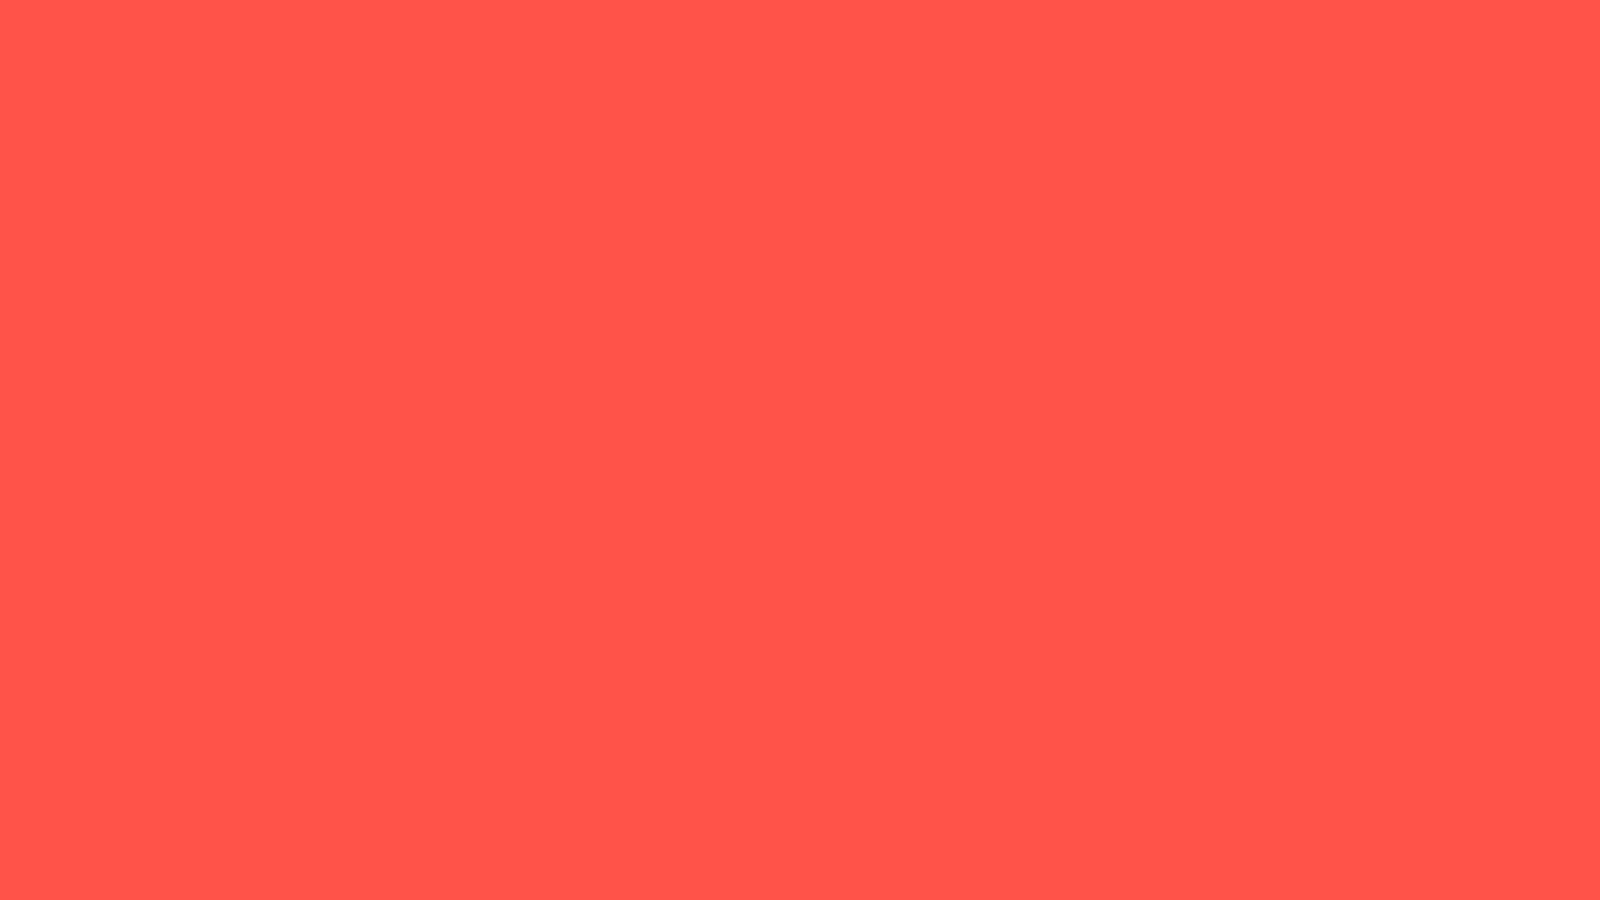 1600x900 Red-orange Solid Color Background